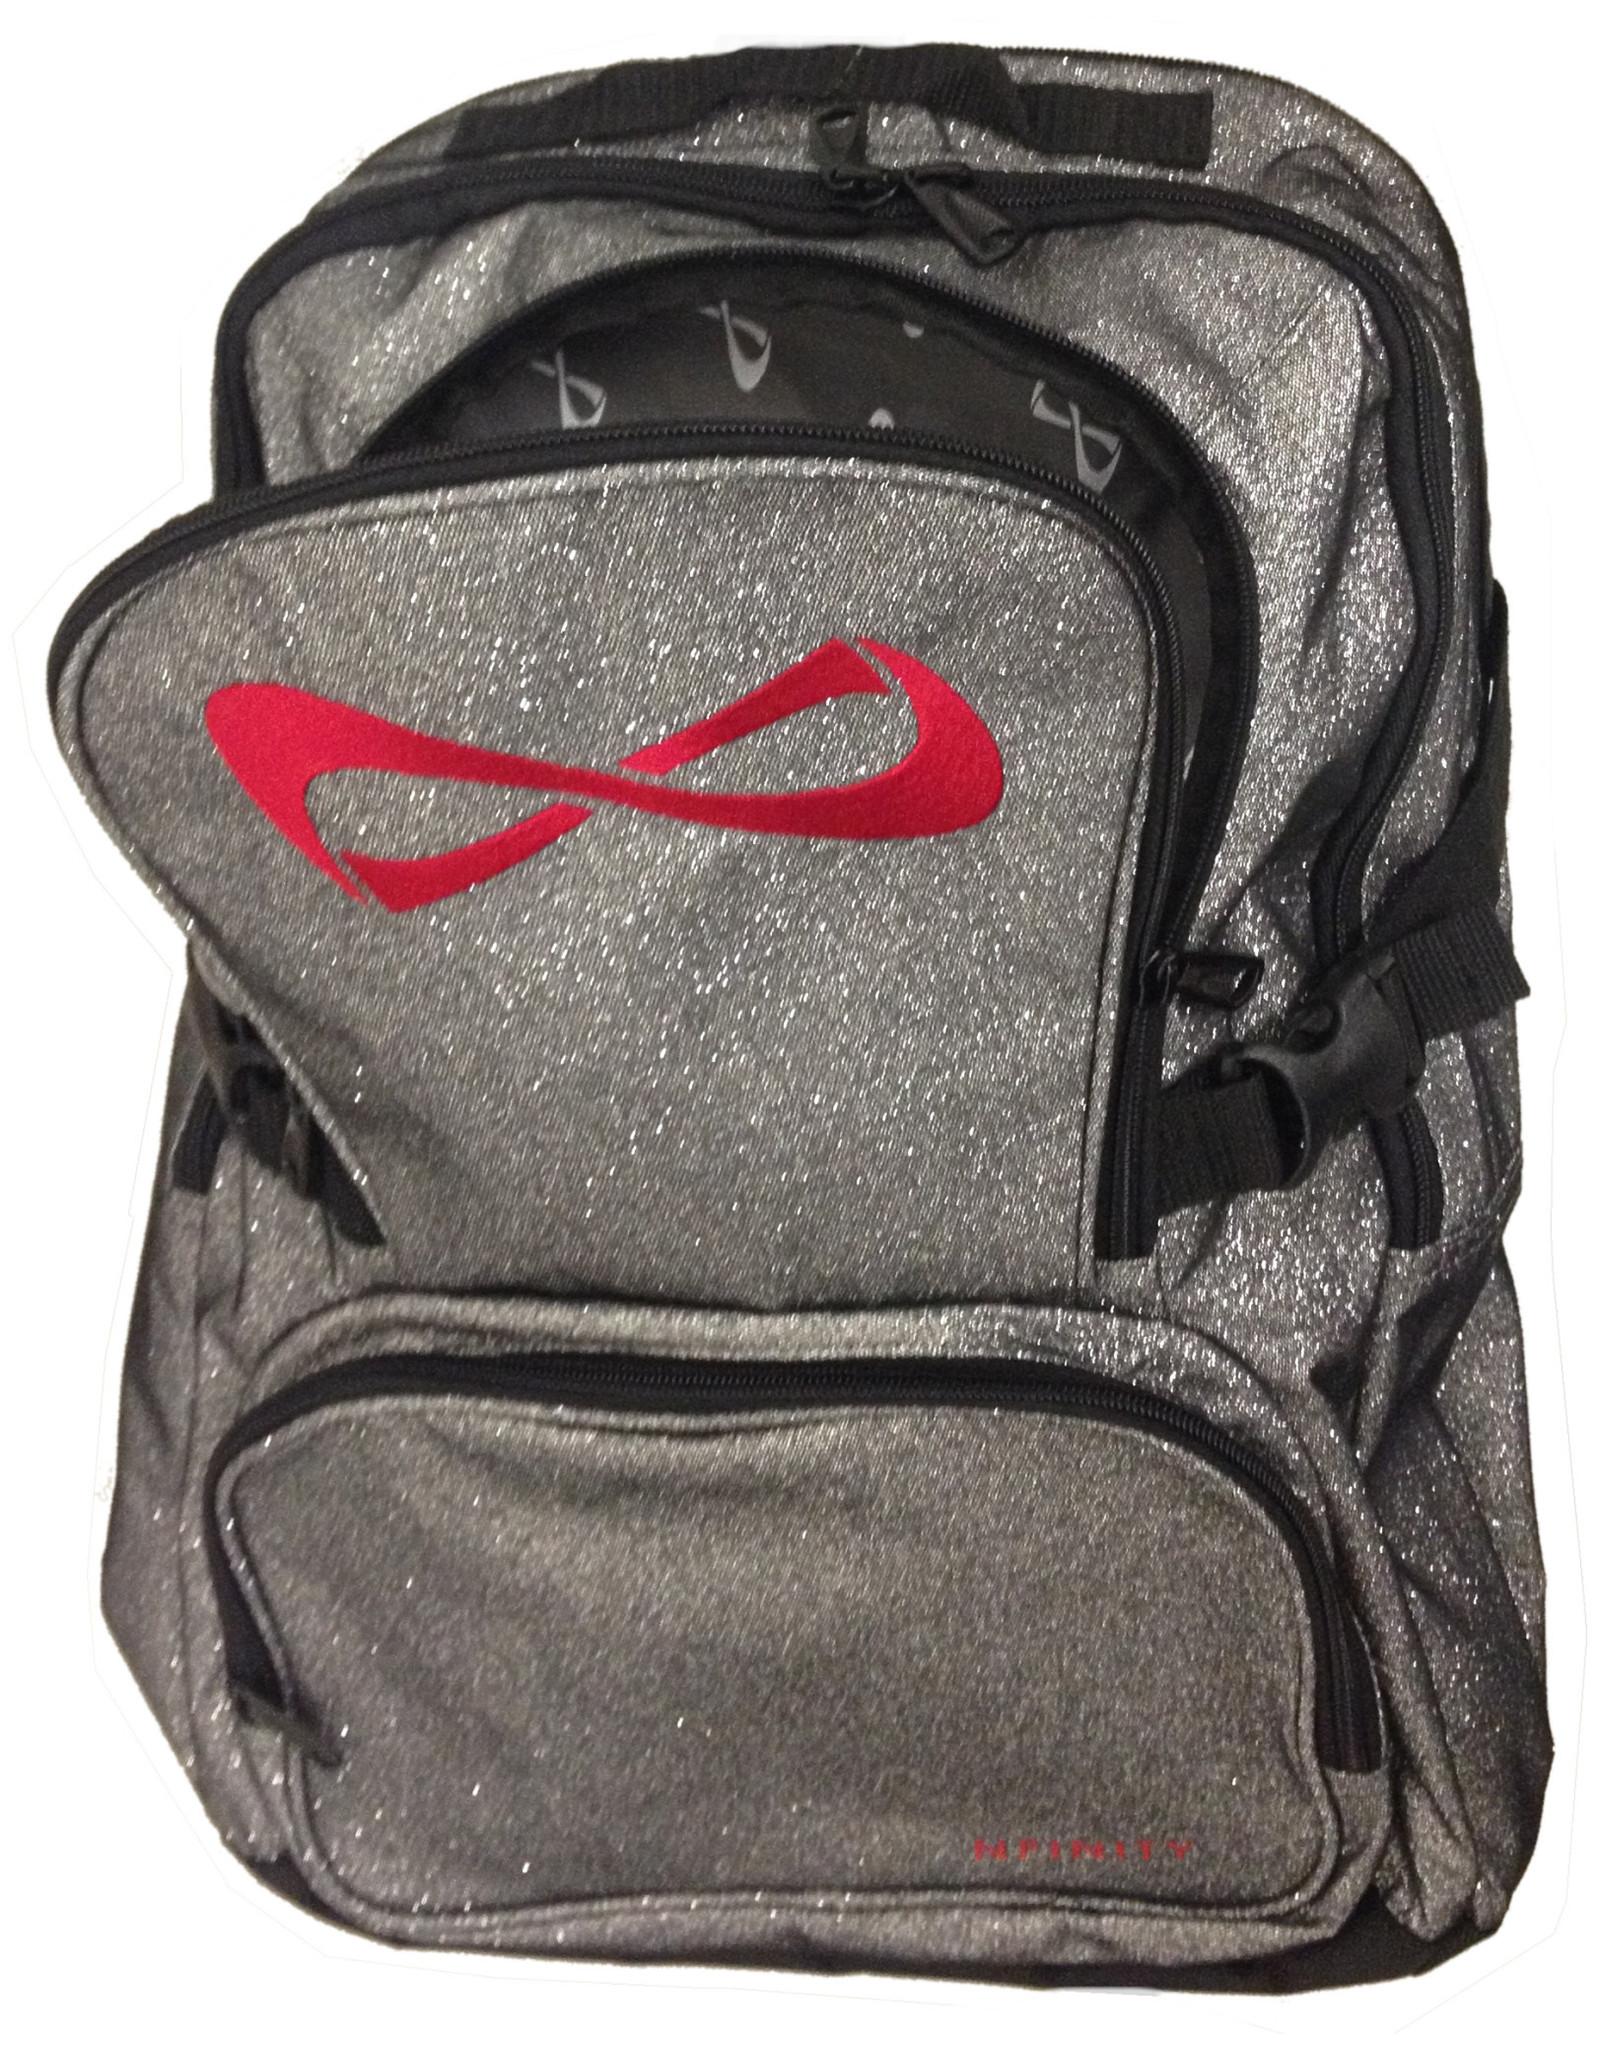 Nfinity Nfinity Sparkle Backpack